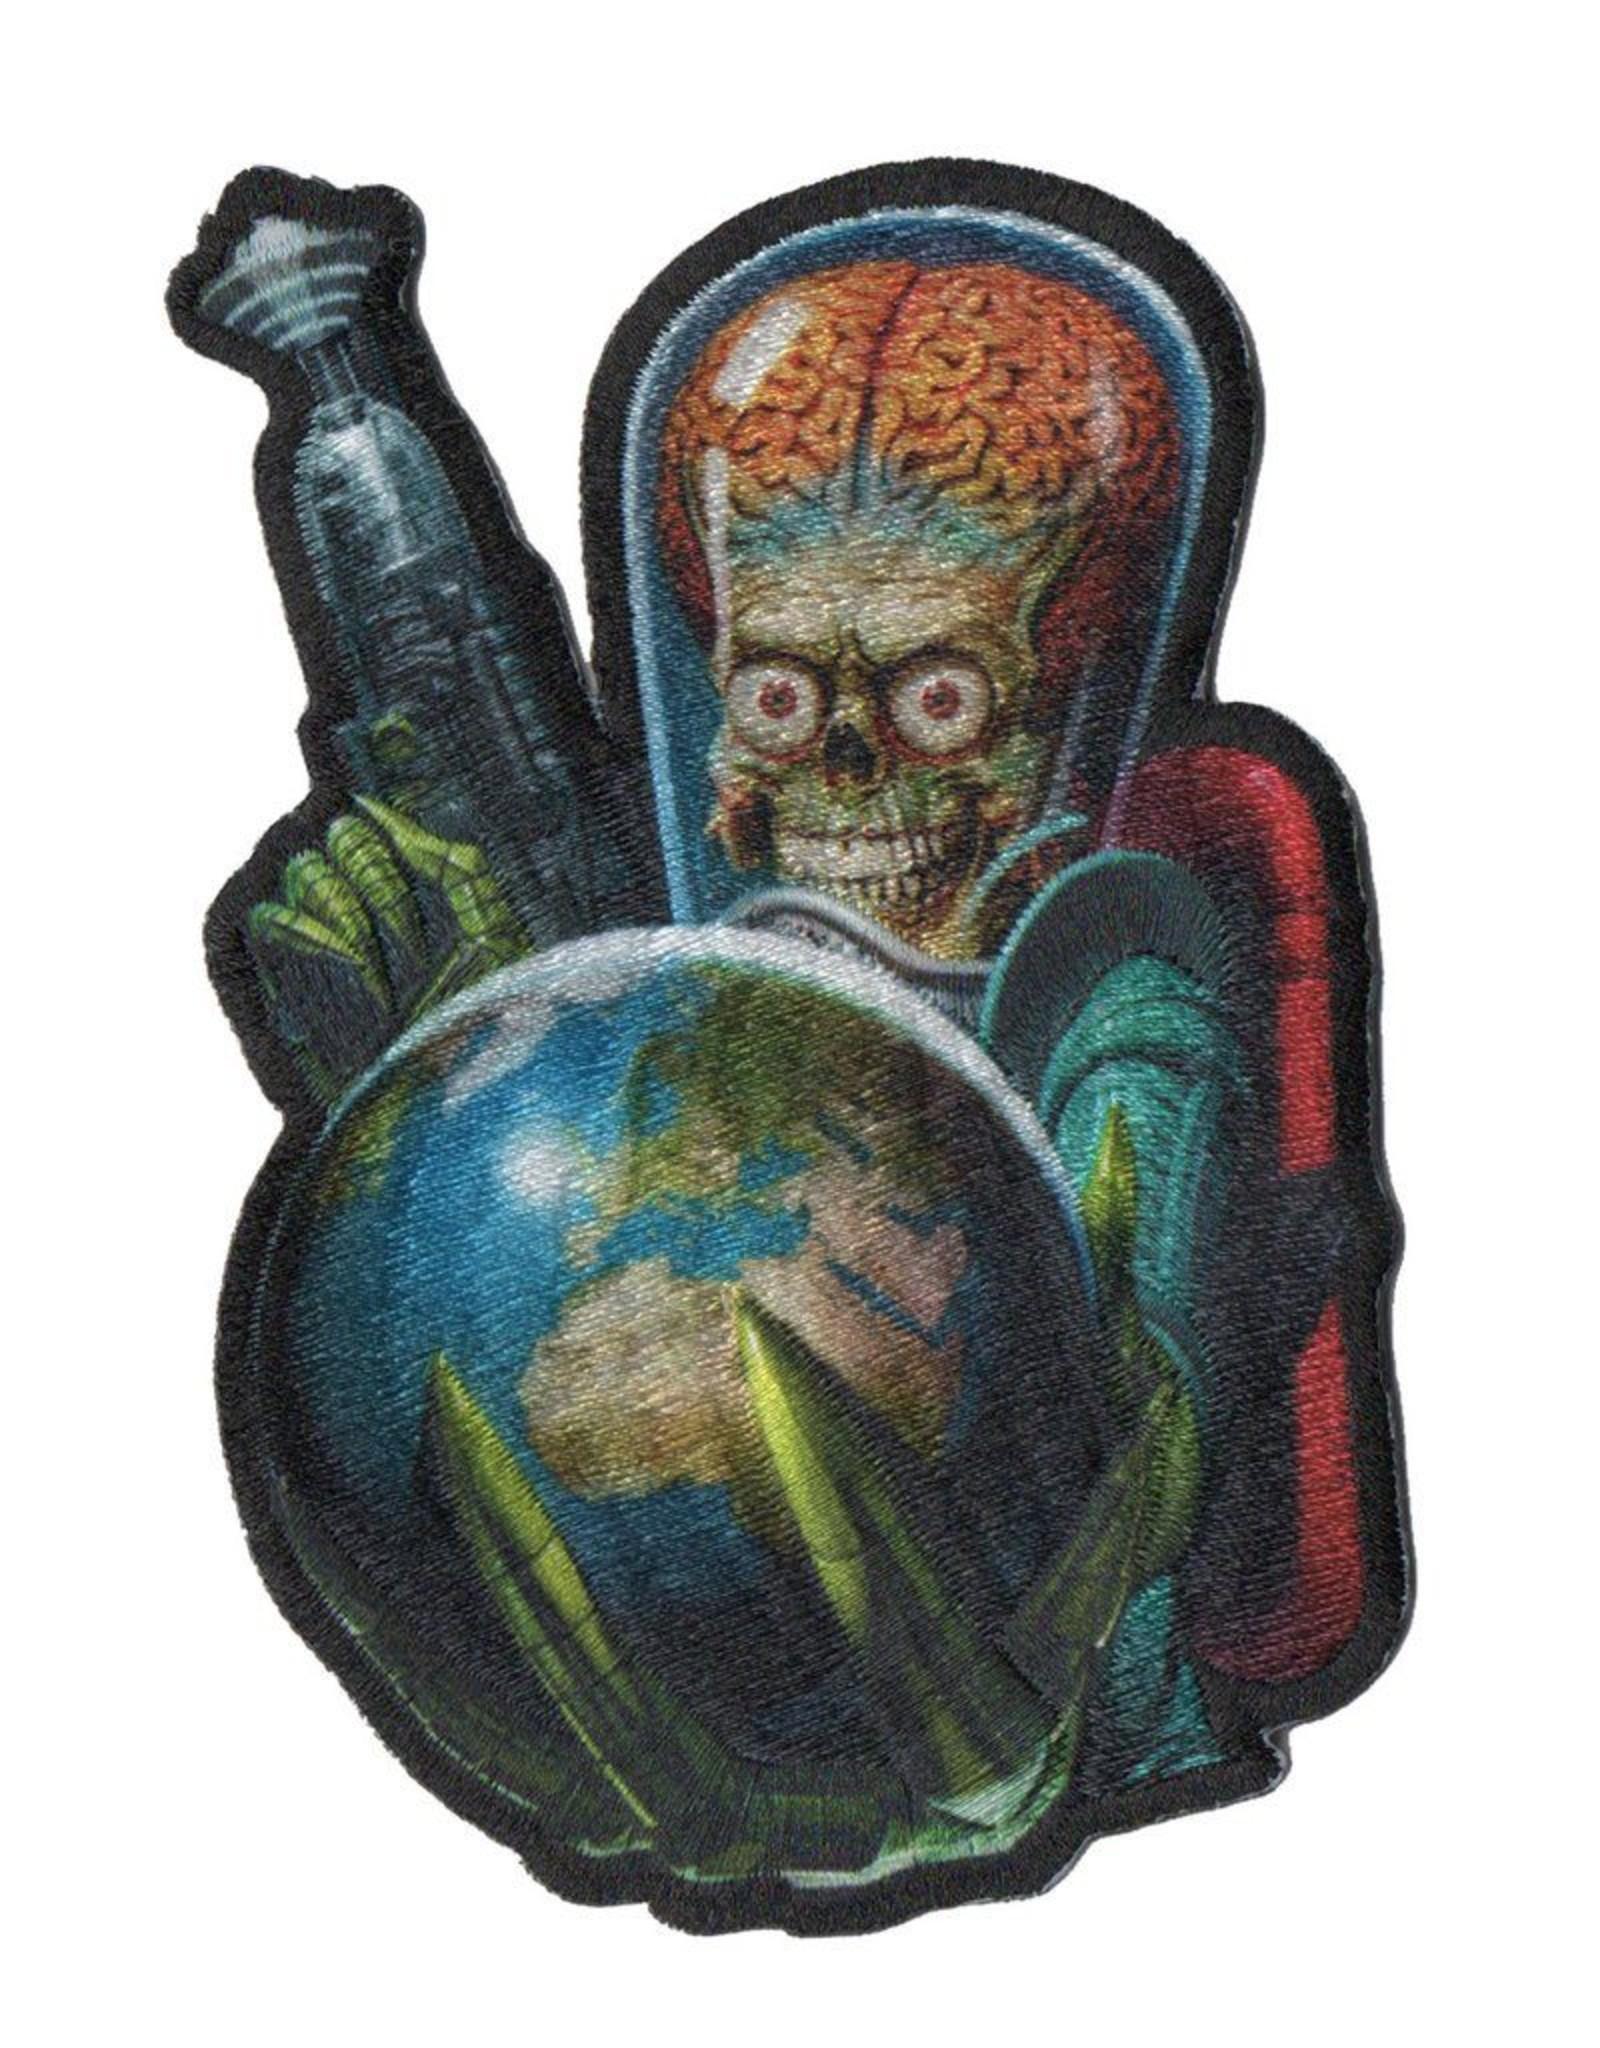 Mars Attacks World Domination Patch